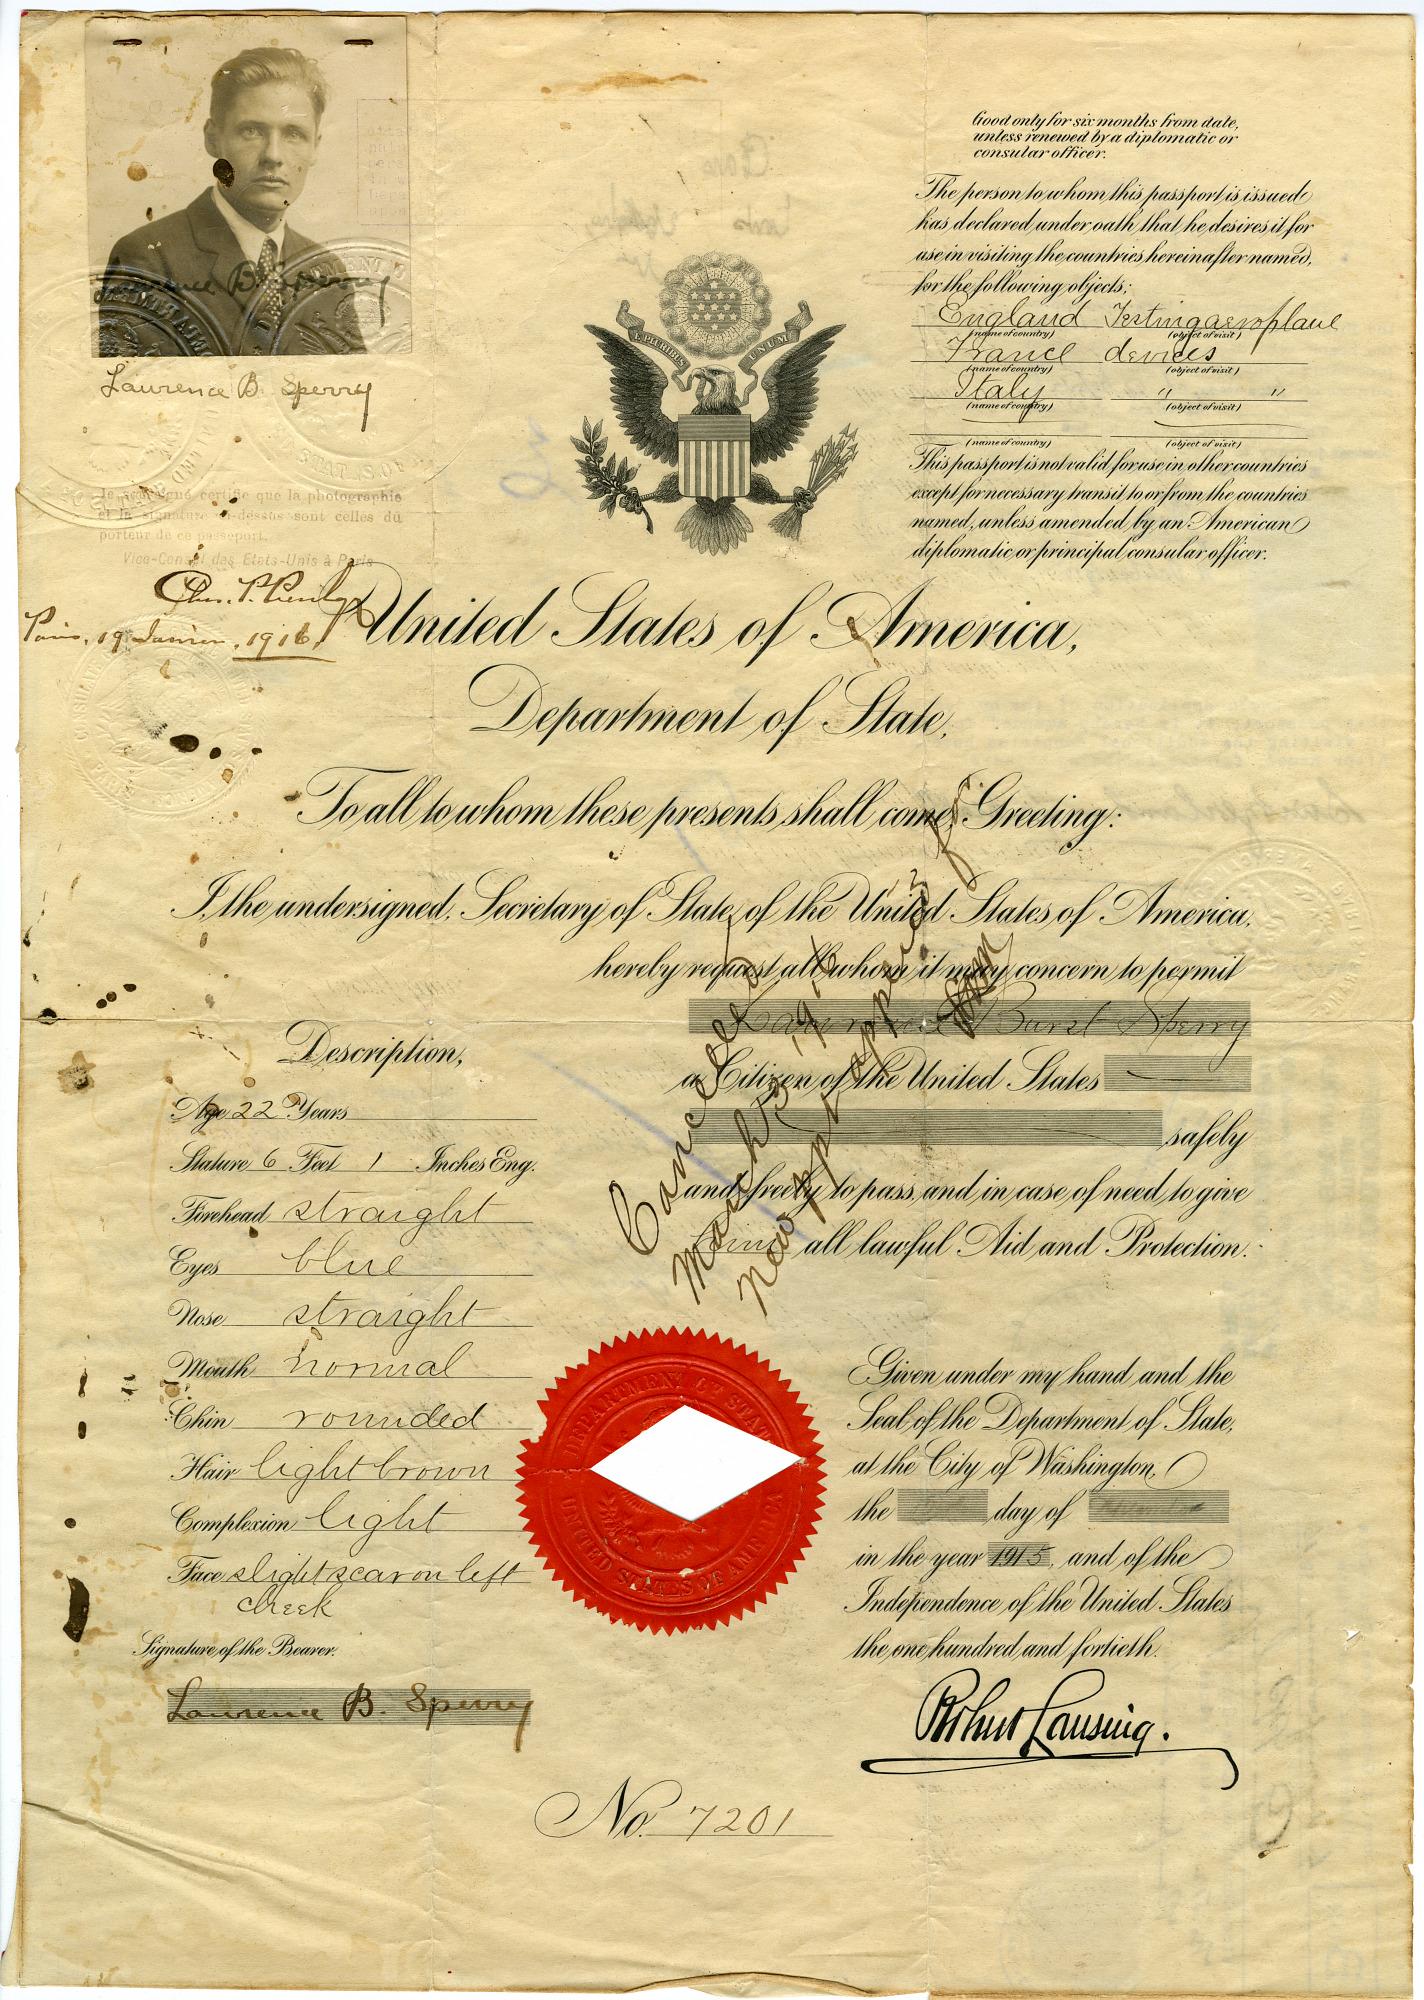 Lawrence Burst Sperry Passport